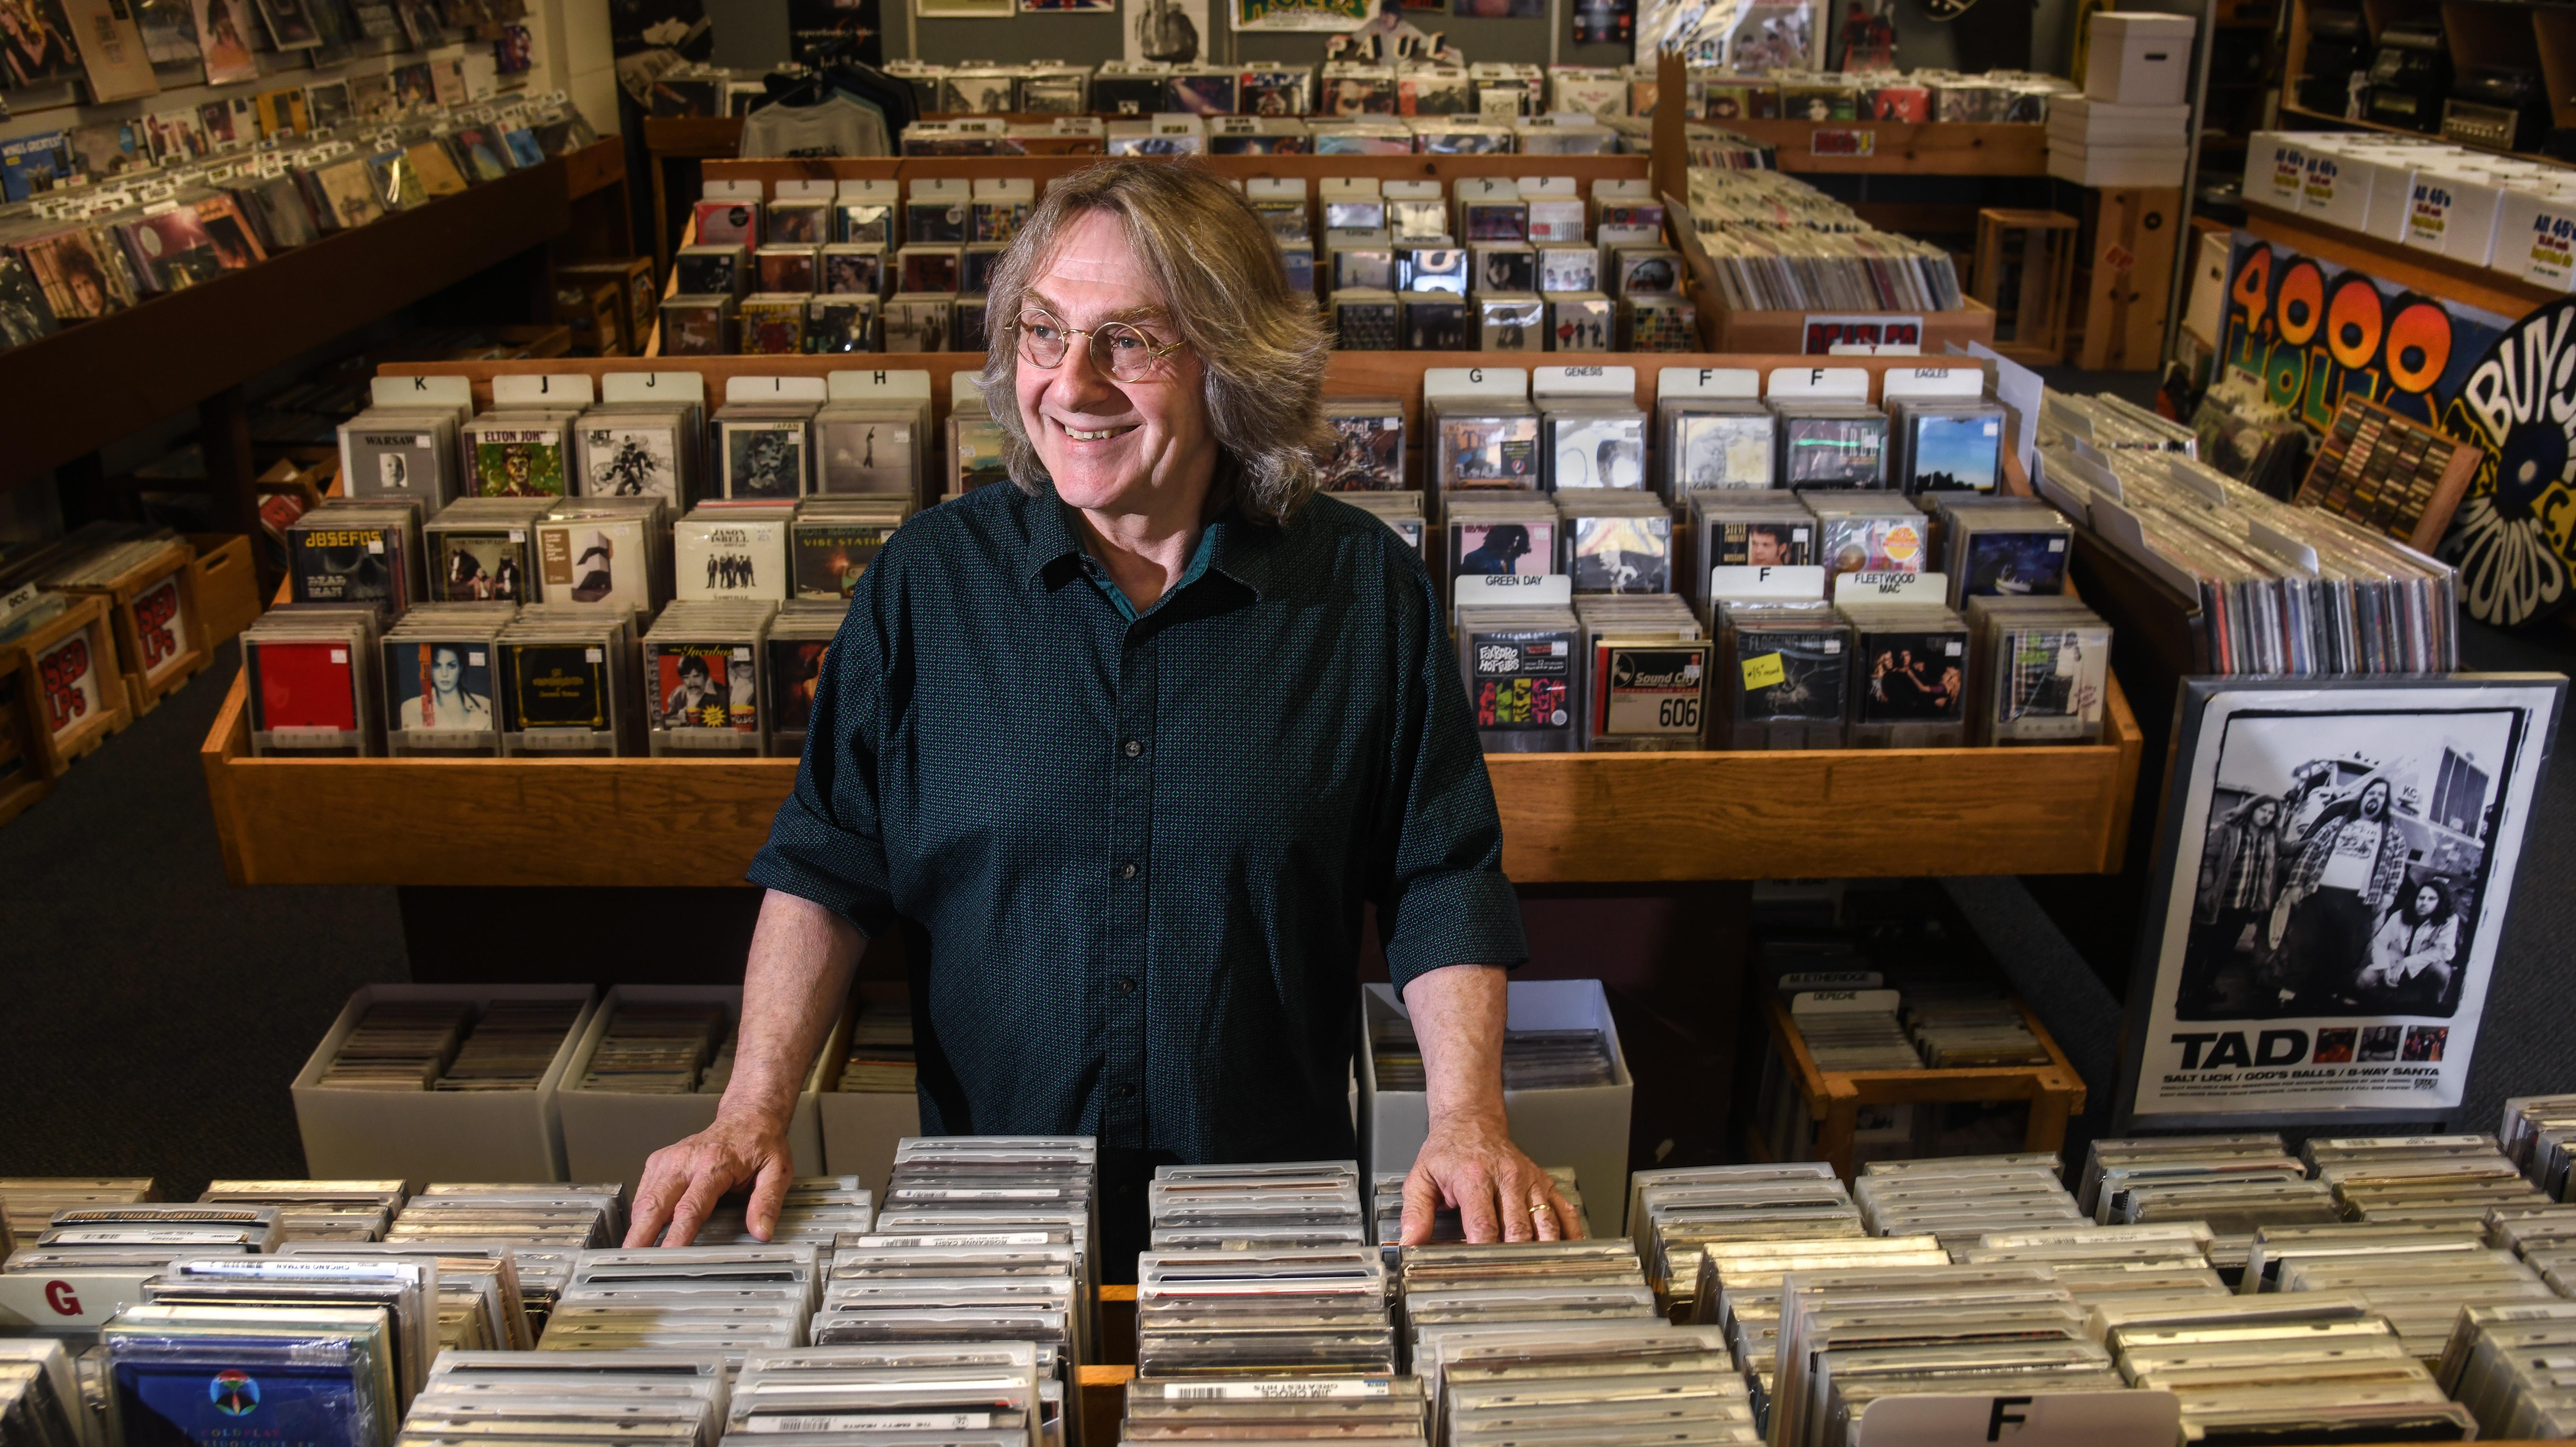 Spokane Staple: Bob Gallagher's shaping Spokane's music